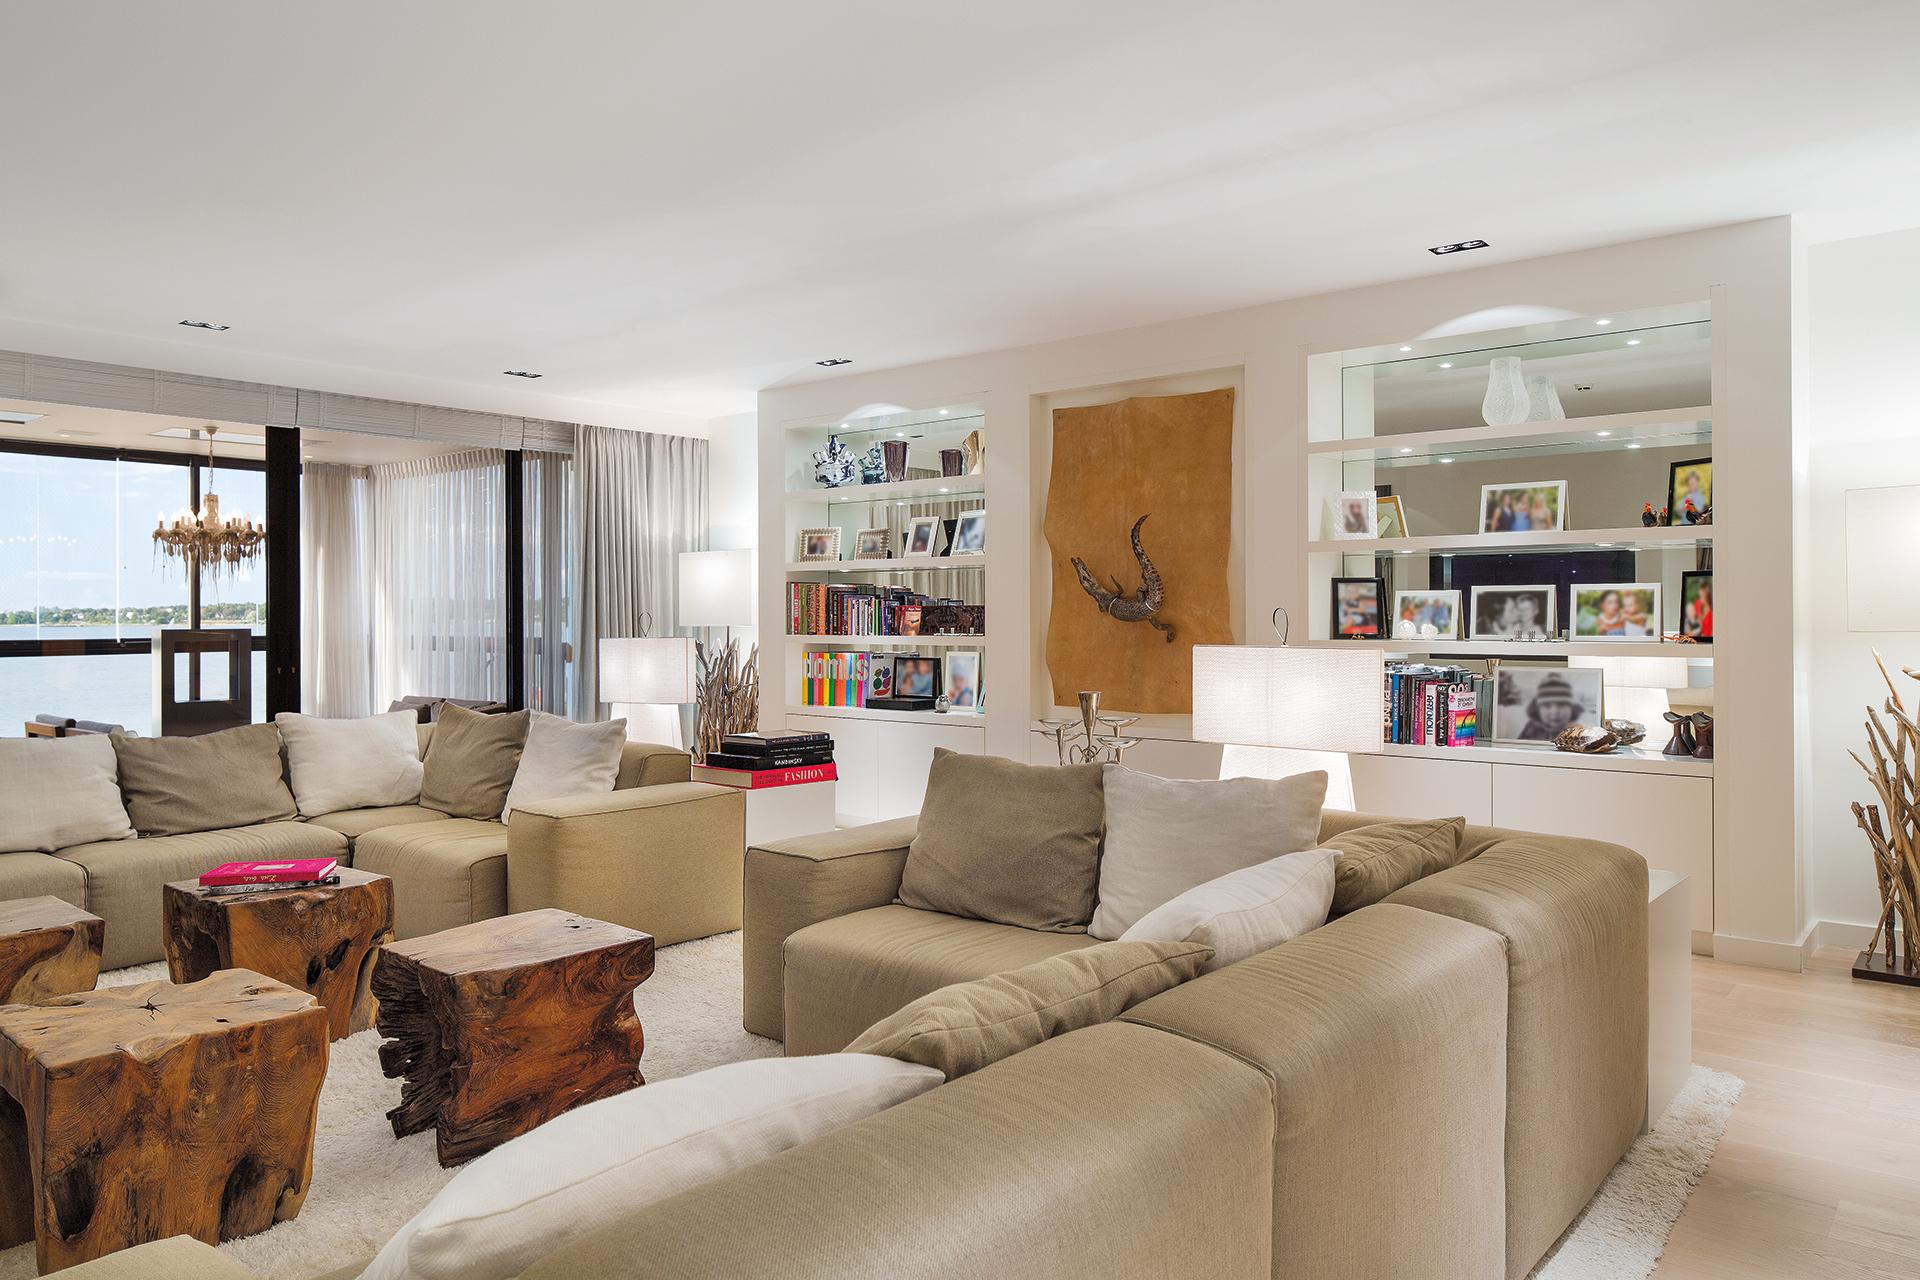 Spacious livingroom with bookshelves and artwork